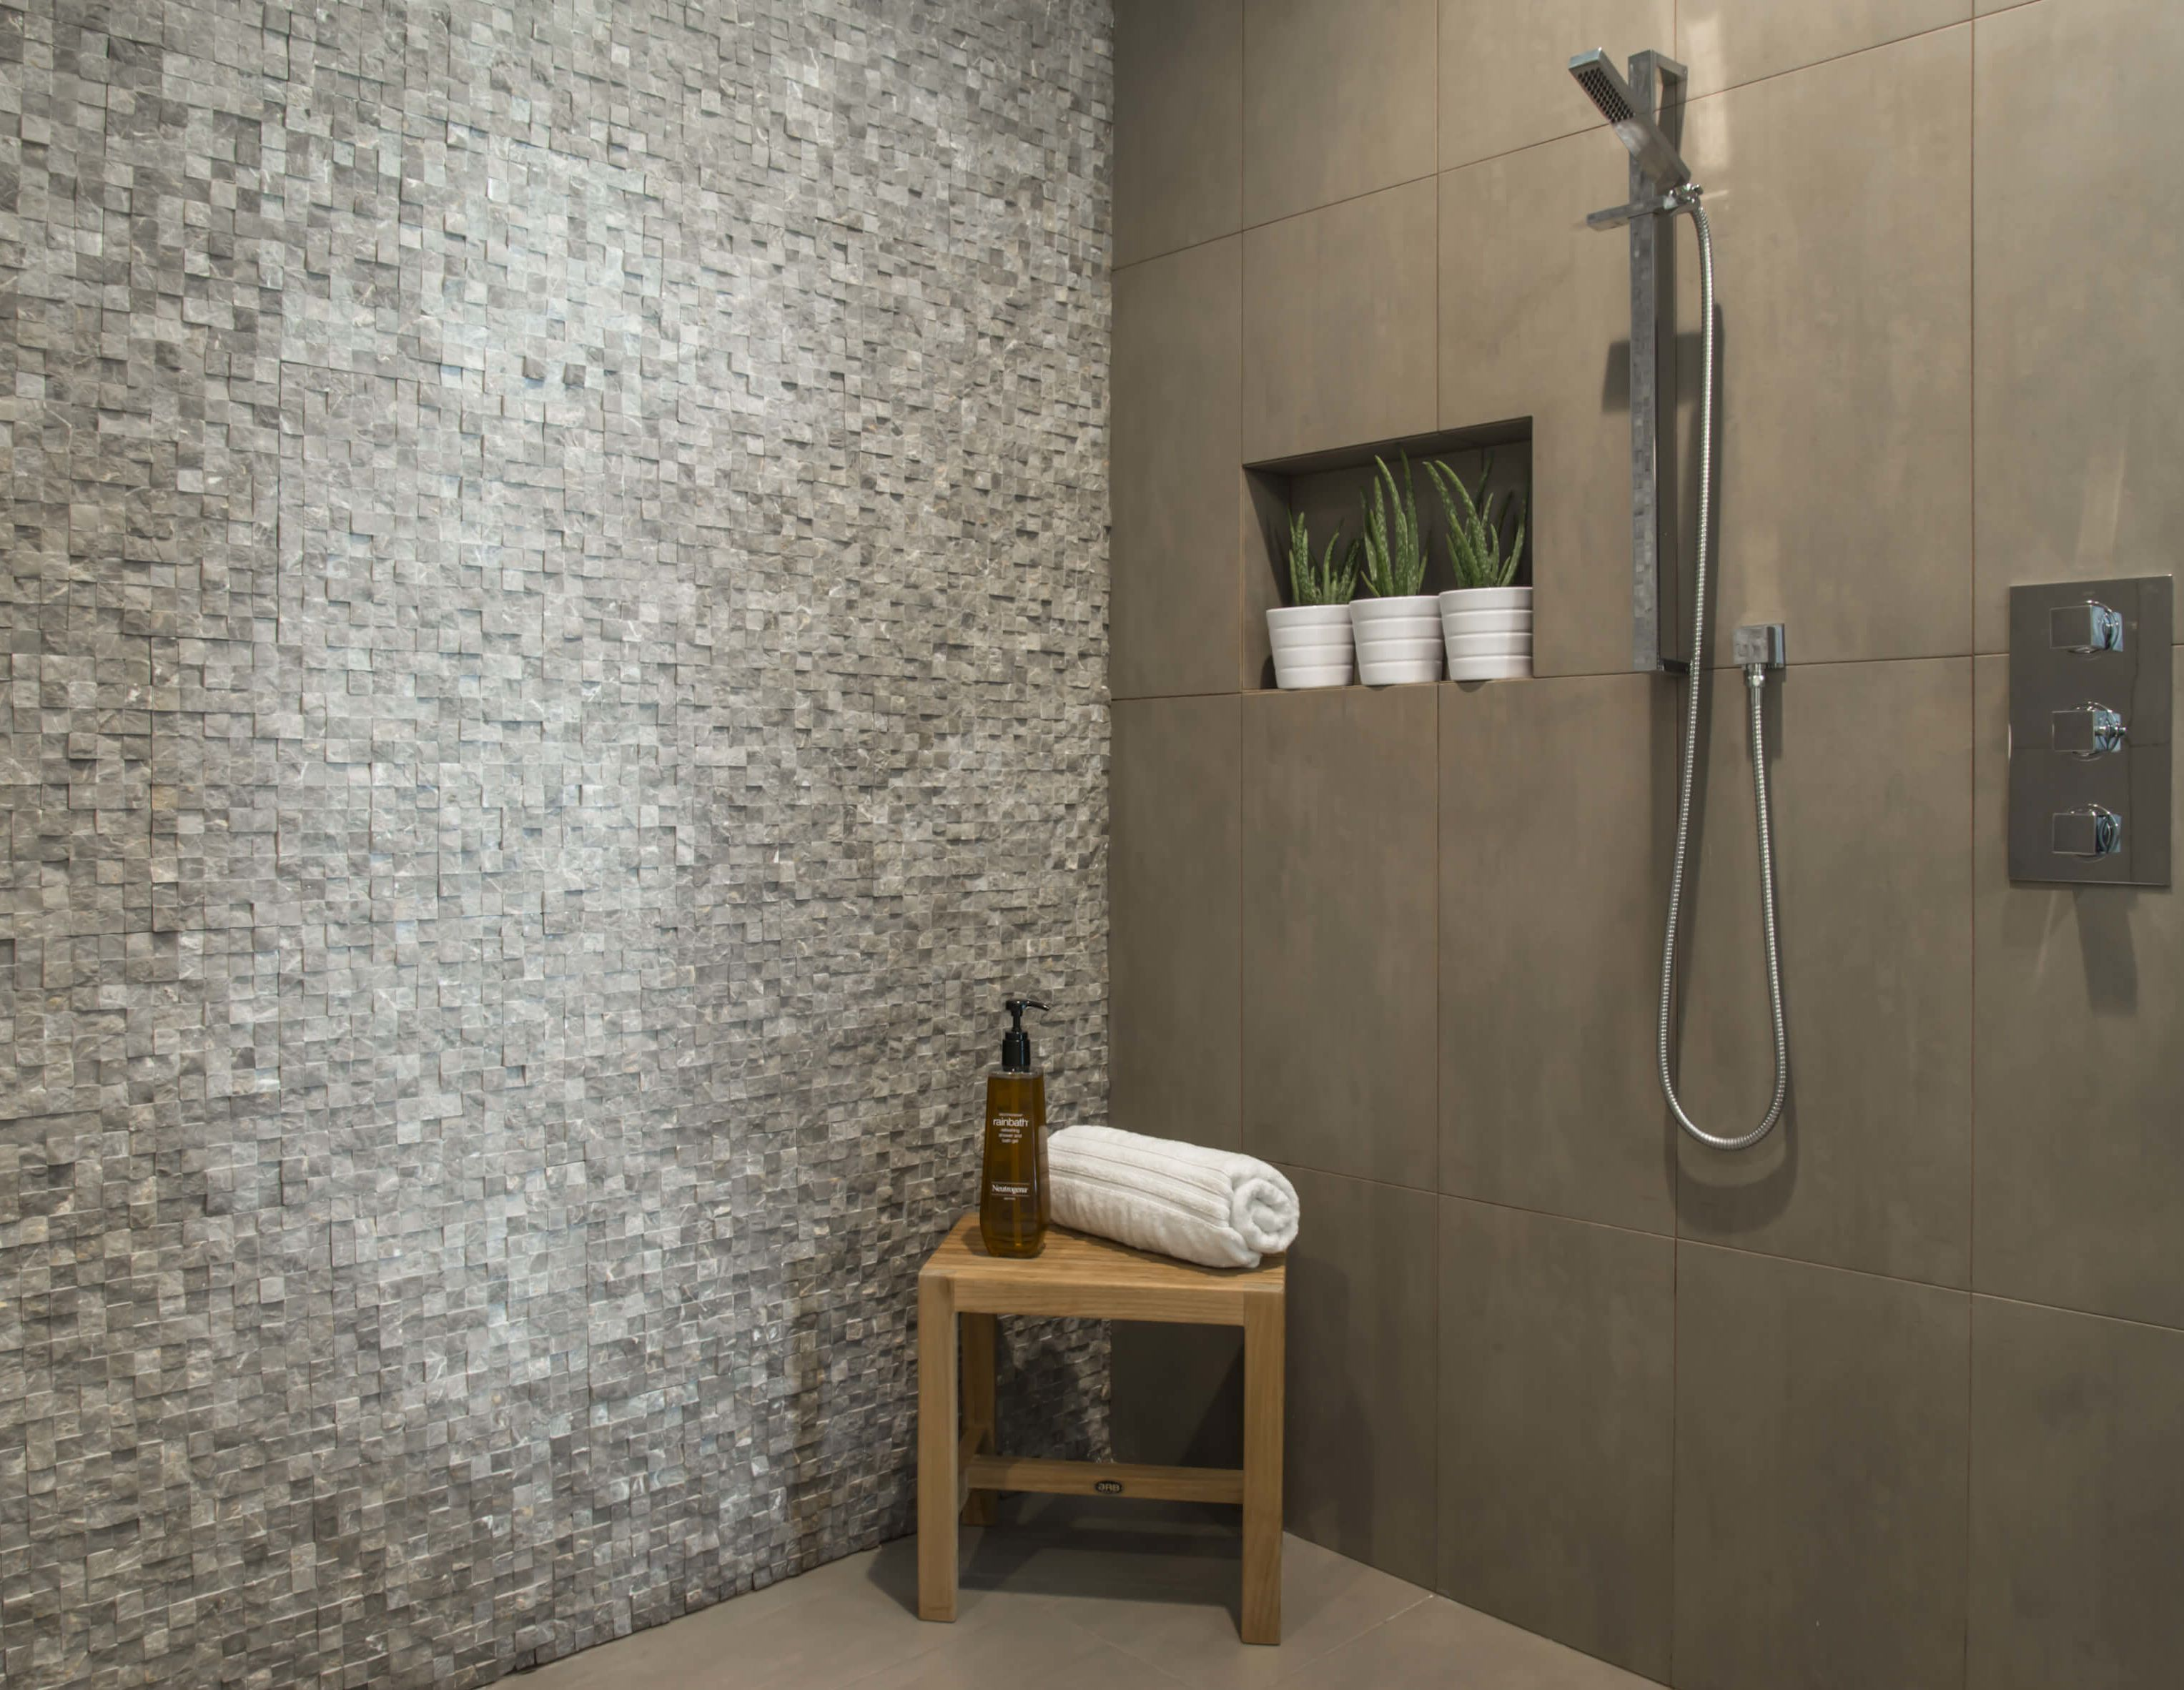 Spa like natural stone and porcelain stone shower designed by Cincinnati Interior Designer, RM Interiors.